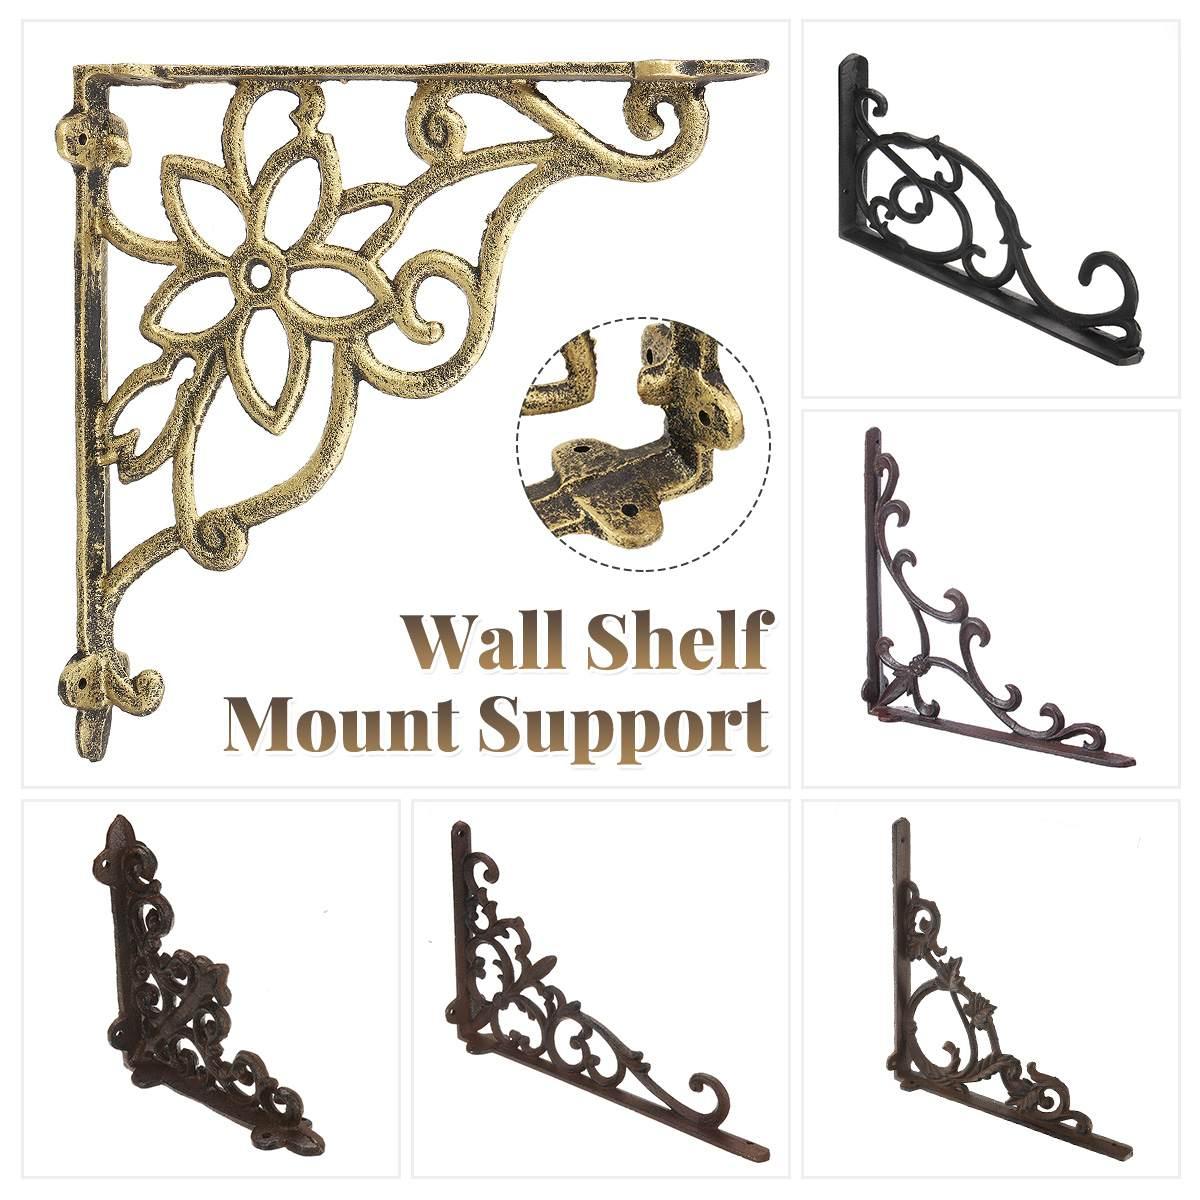 1pcs Cast Iron Triangular Angle Bracket Heavy Support Metal Release Catch Support Wall Mount Shelf Bracket Home DIY Decoration